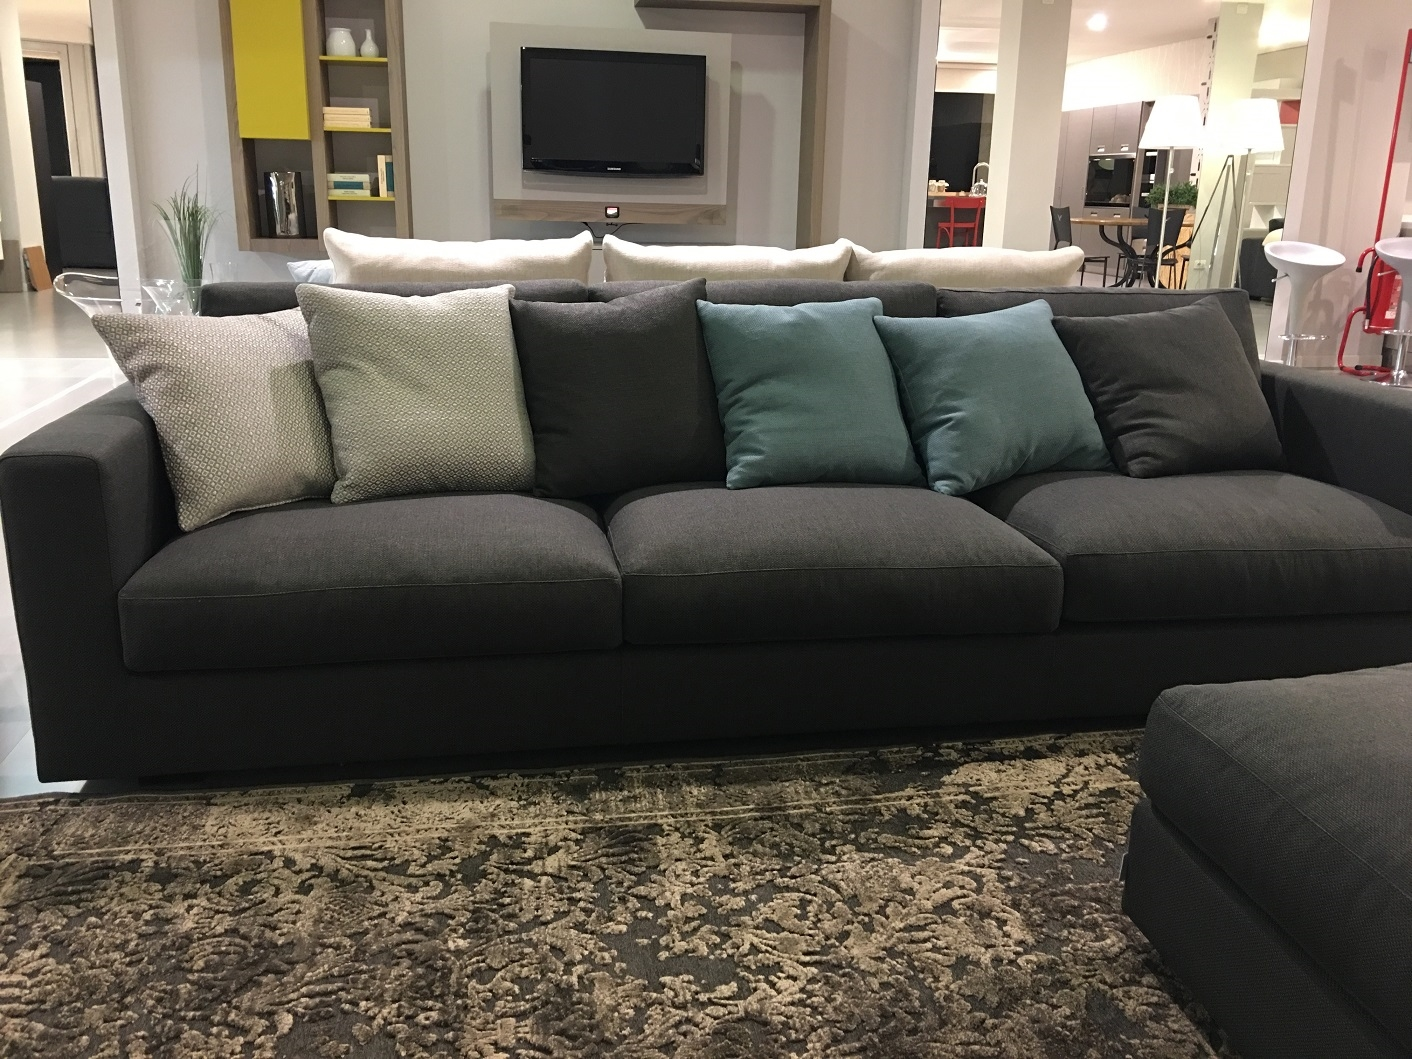 Divano swan harvard divani lineari tessuto divano 4 posti for Divano 4 posti